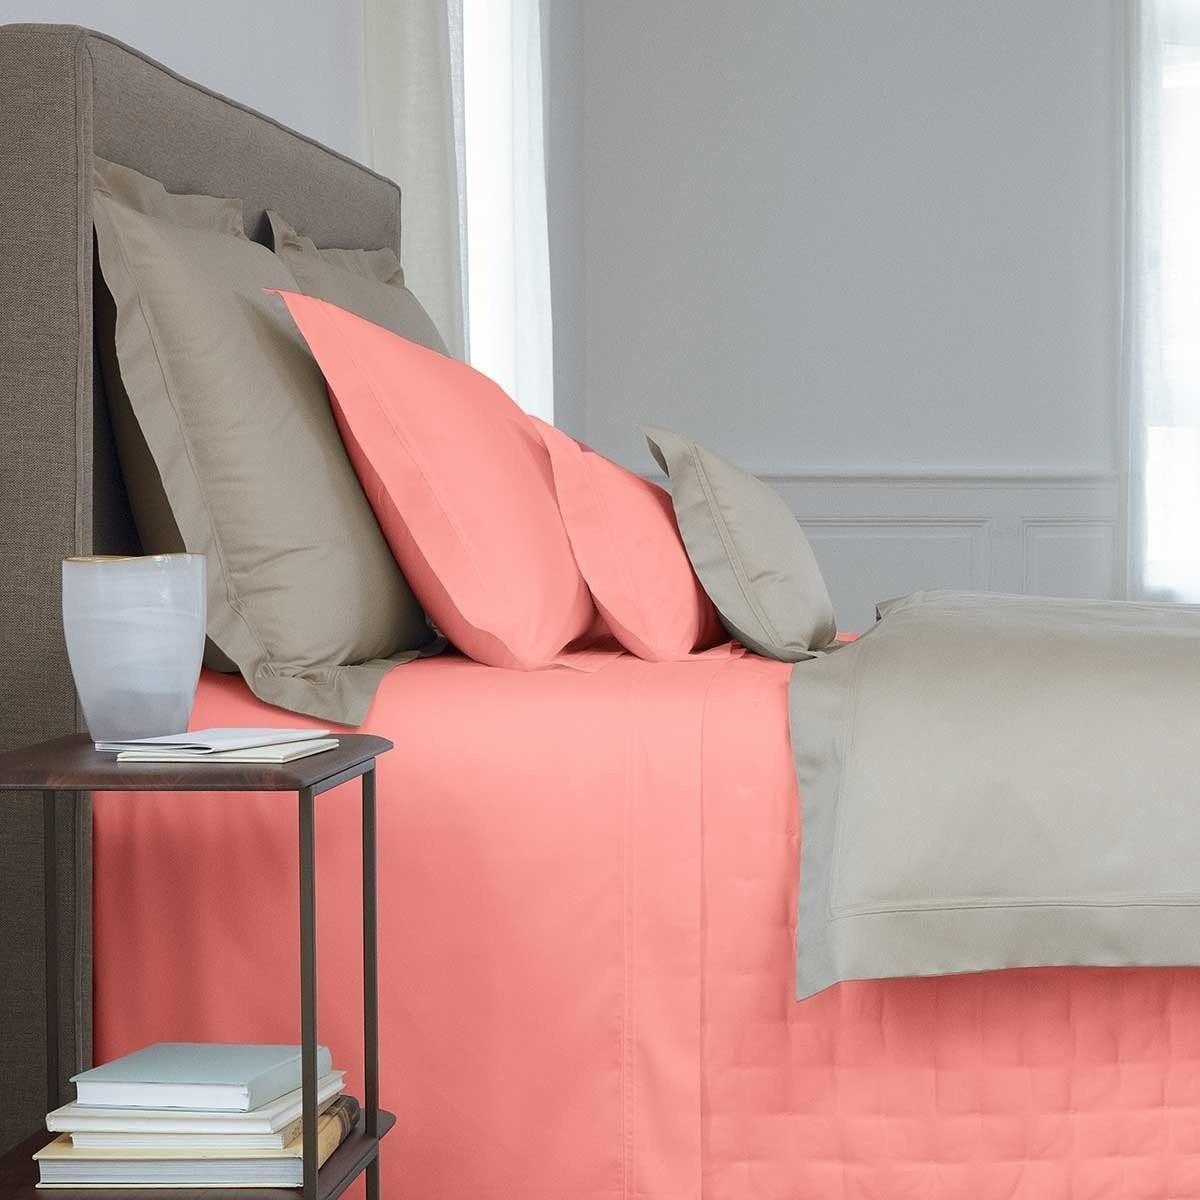 TRIOMPHE Peche Bed Series